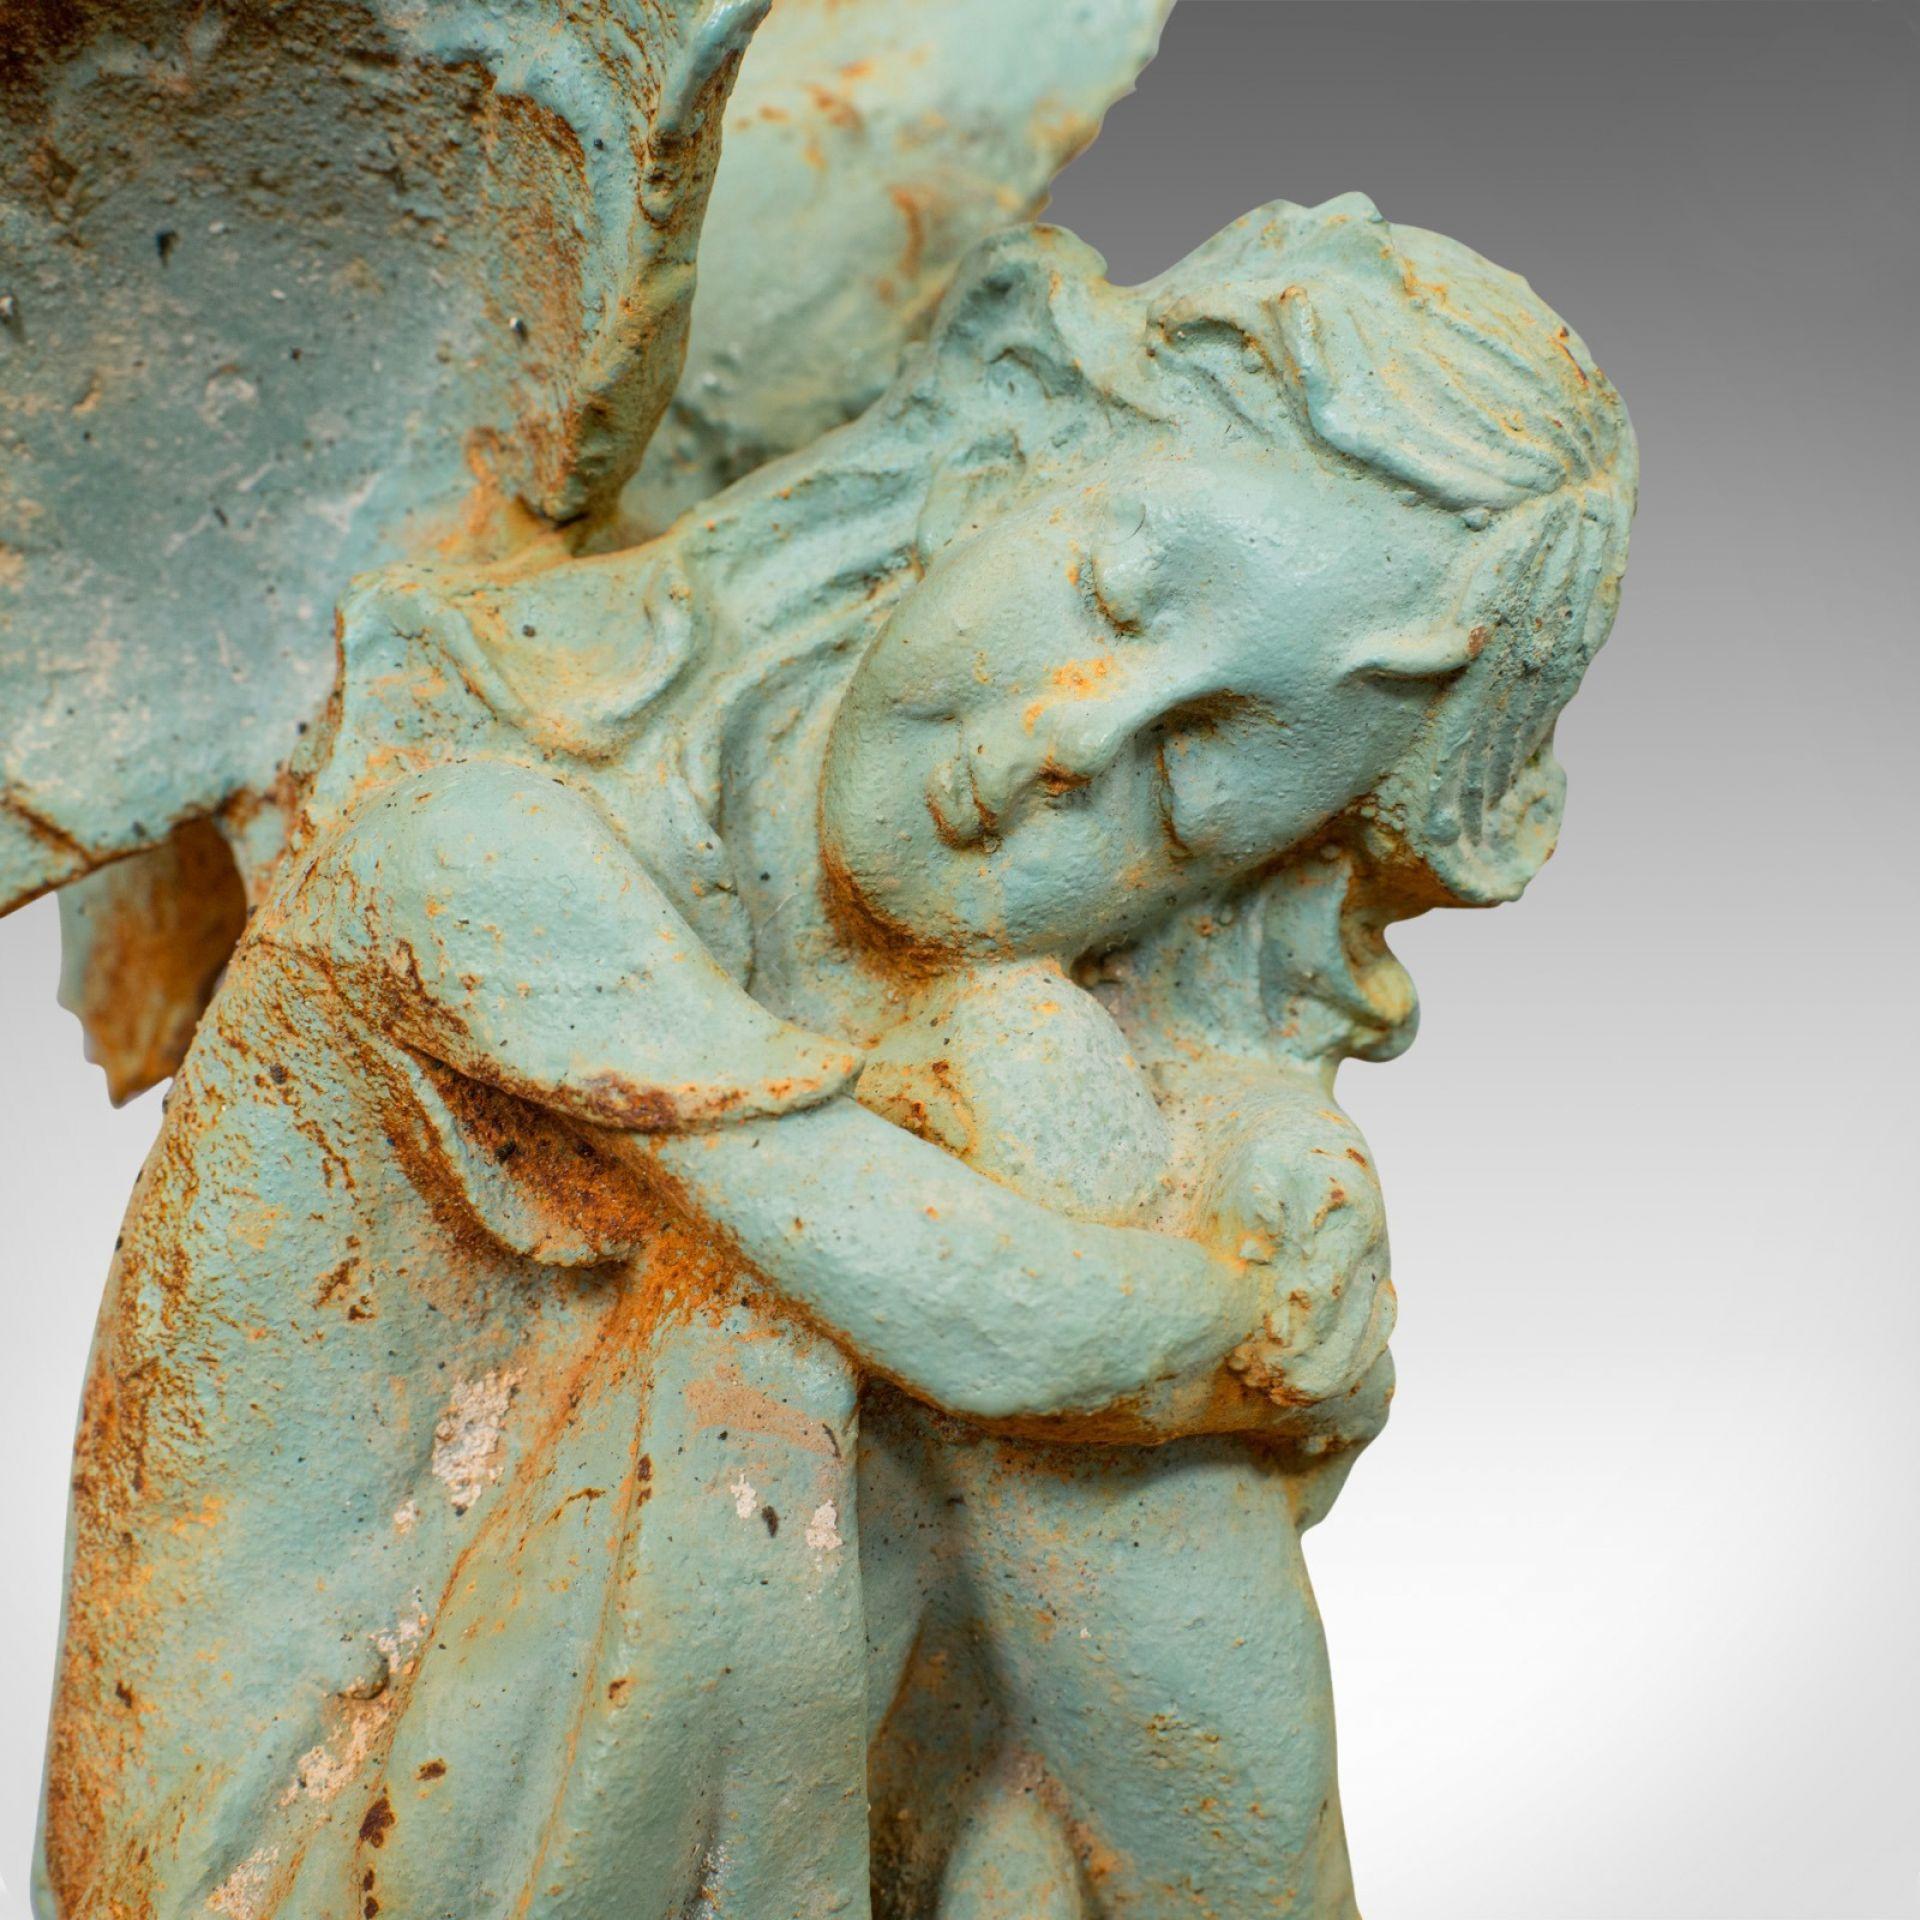 Vintage  Fairy Ornament, English, Cast Iron, Garden, Decorative, Statuette